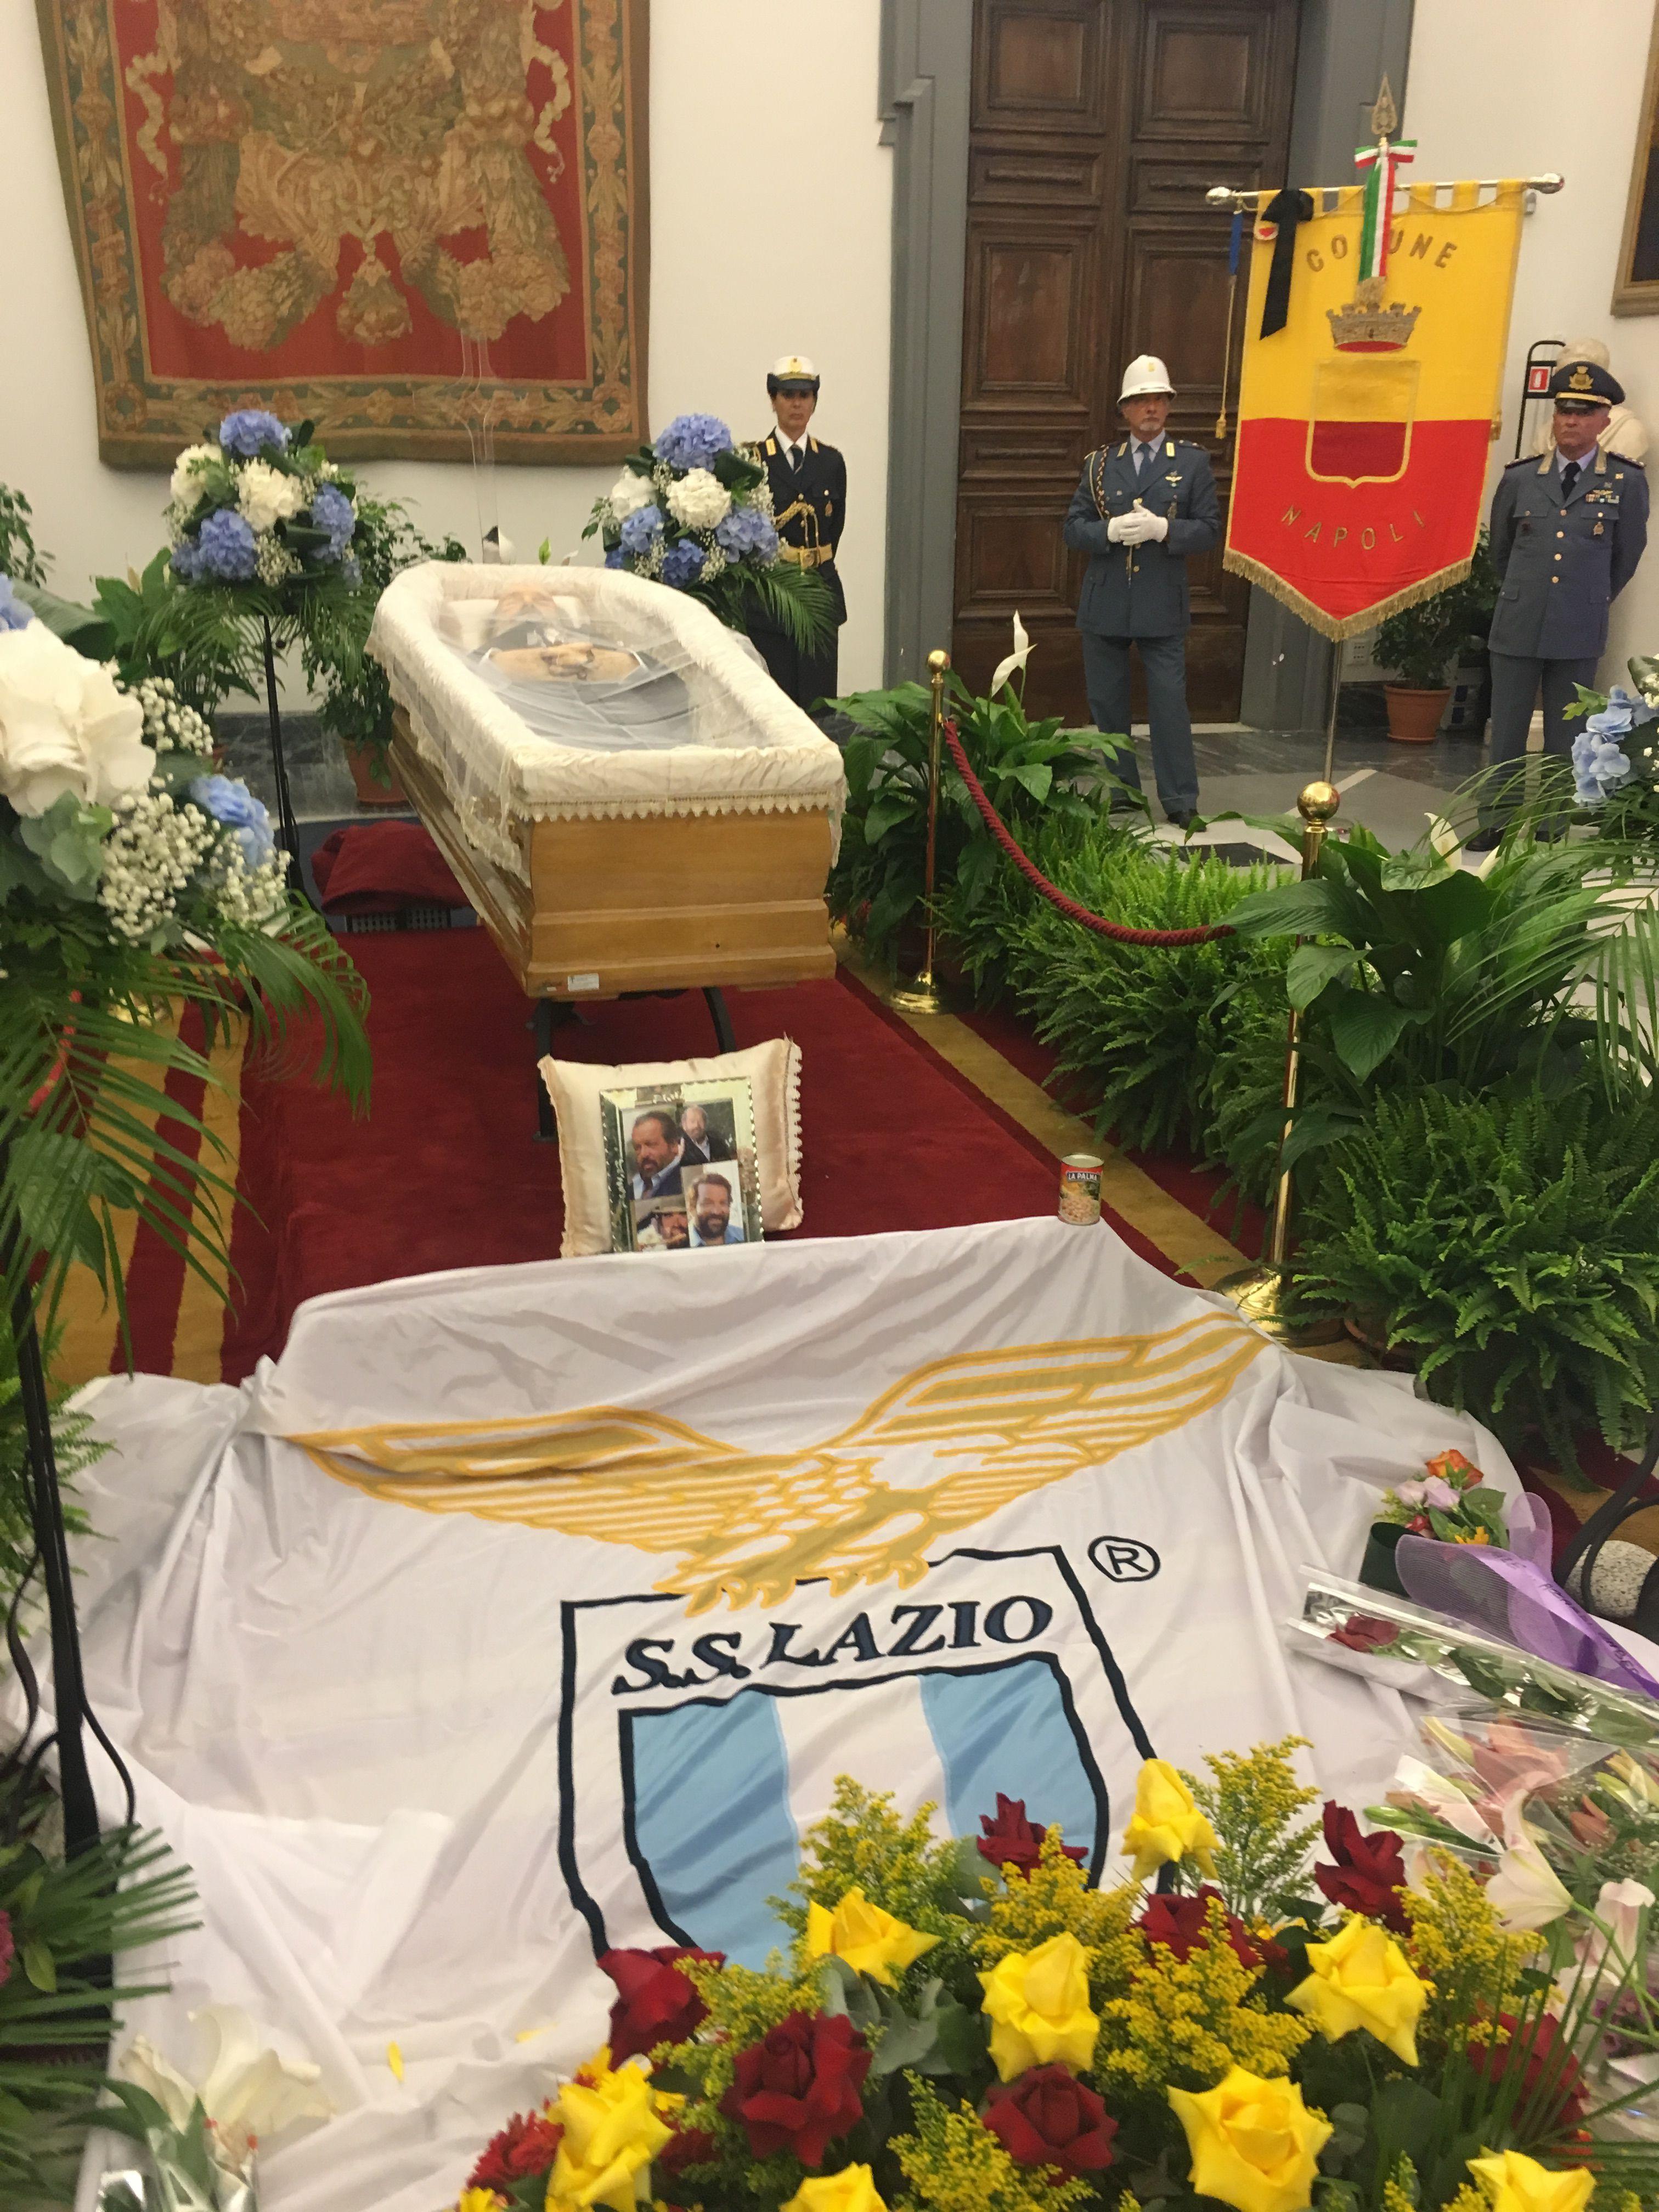 Filebud spencer funeral in rome by mardetanha 4g wikimedia filebud spencer funeral in rome by mardetanha 4g izmirmasajfo